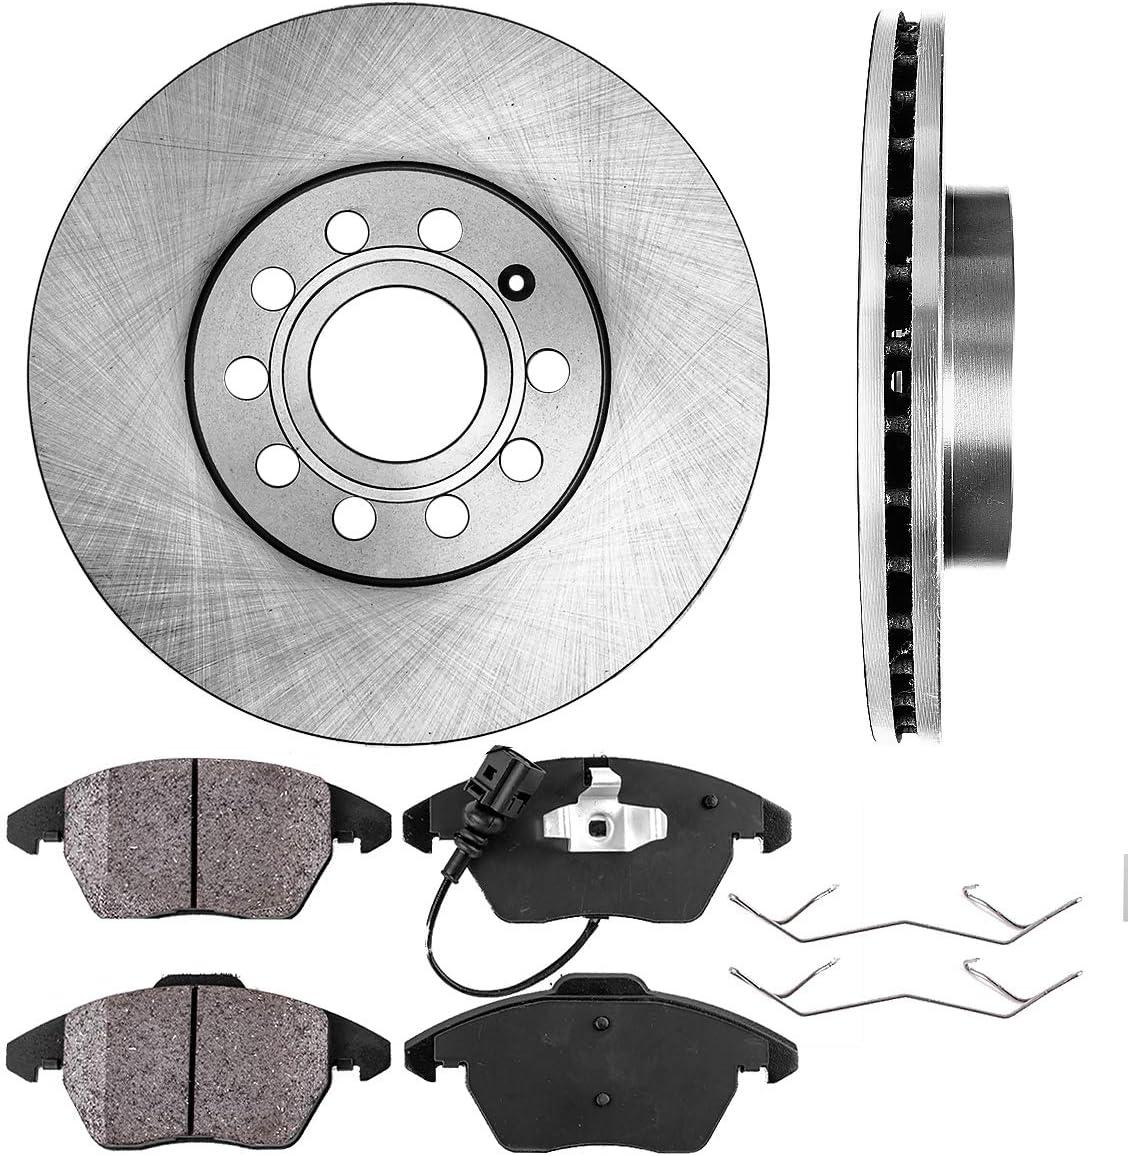 CRK11426 FRONT 288 mm Premium OE 5 Lug Ceramic Brake Pads 2 Clips 4 Brake Disc Rotors +